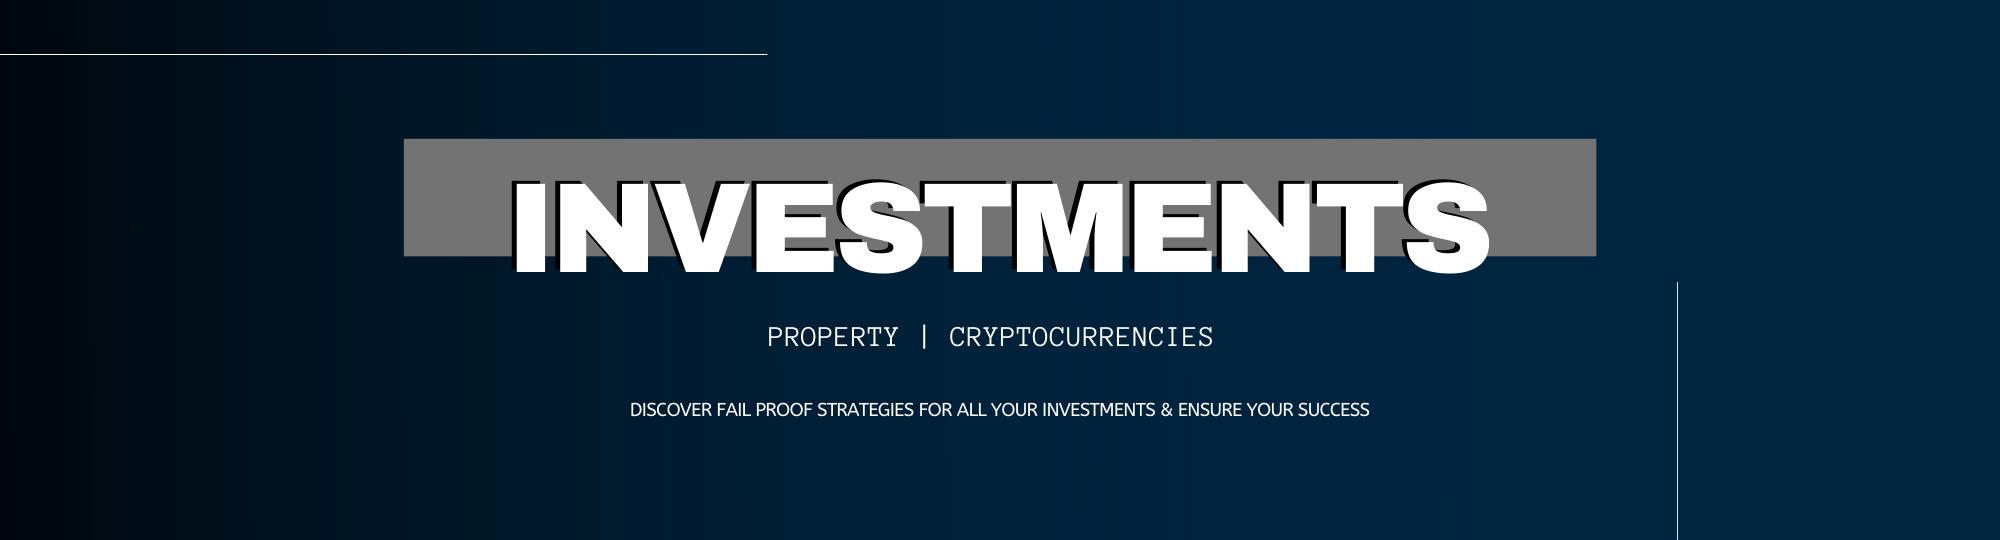 Investment Training